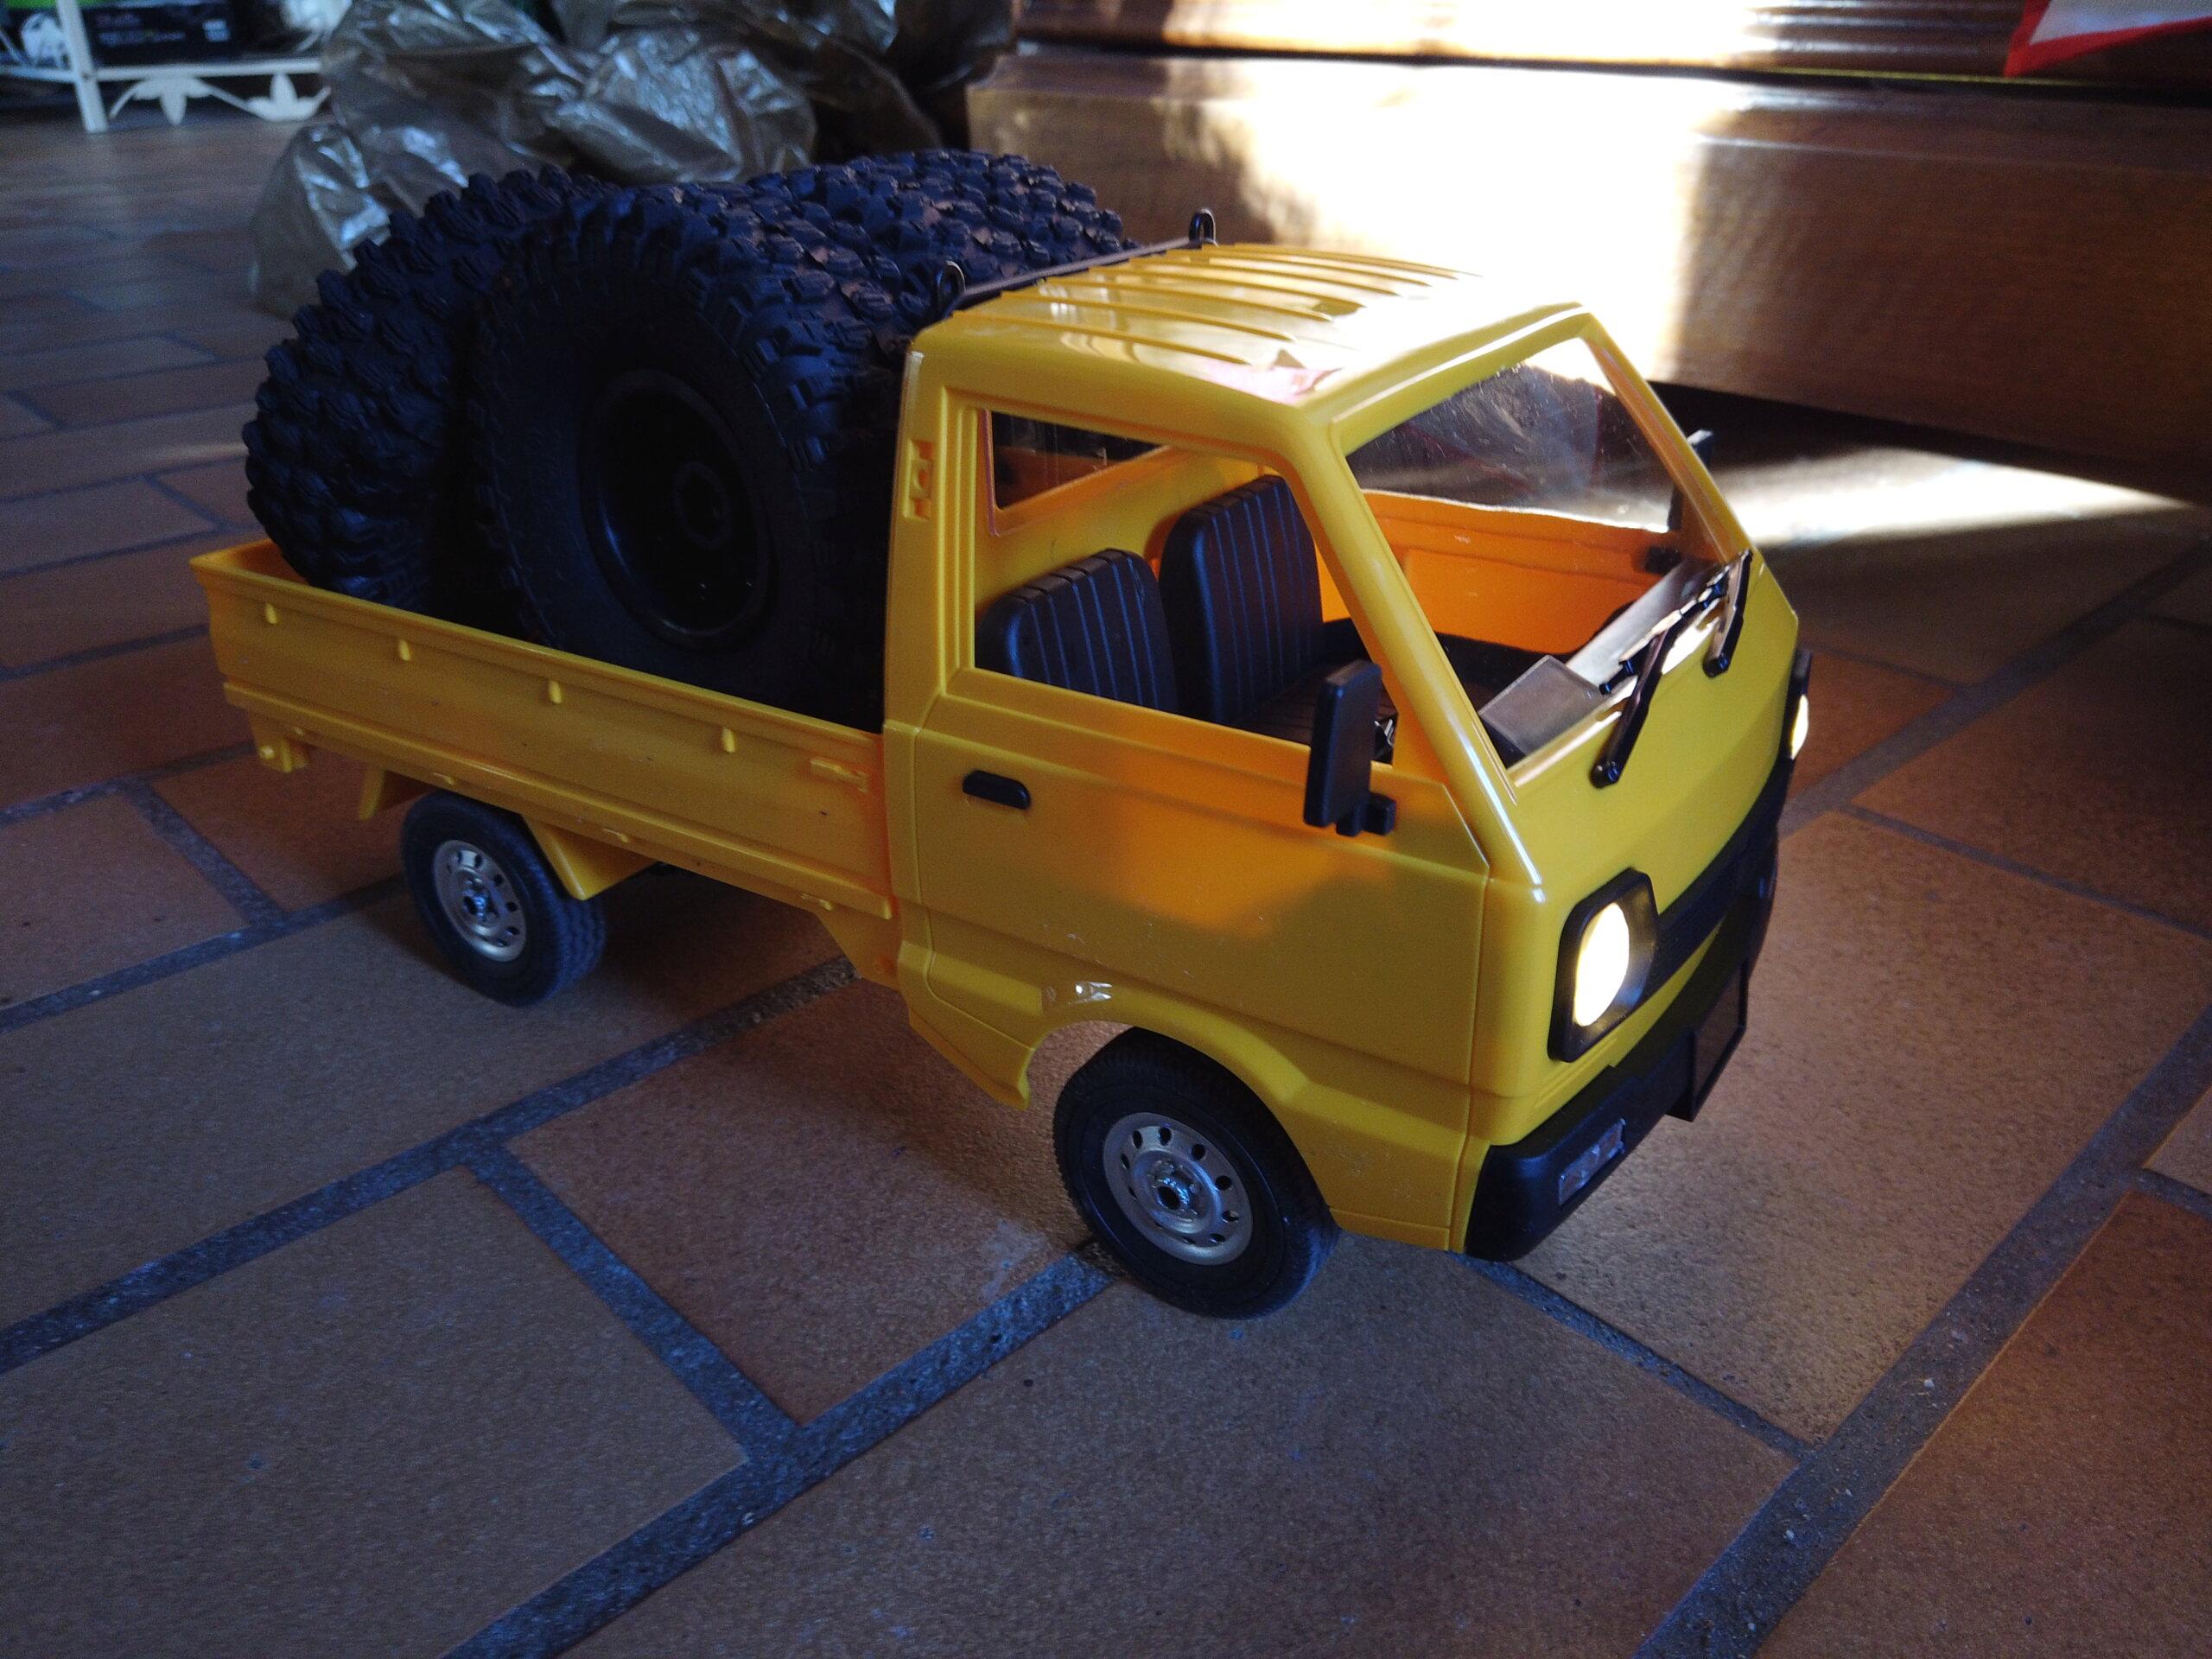 Un énorme camion de plus, le WPL D12 Suzuki Carry 1/10... Dji_0114